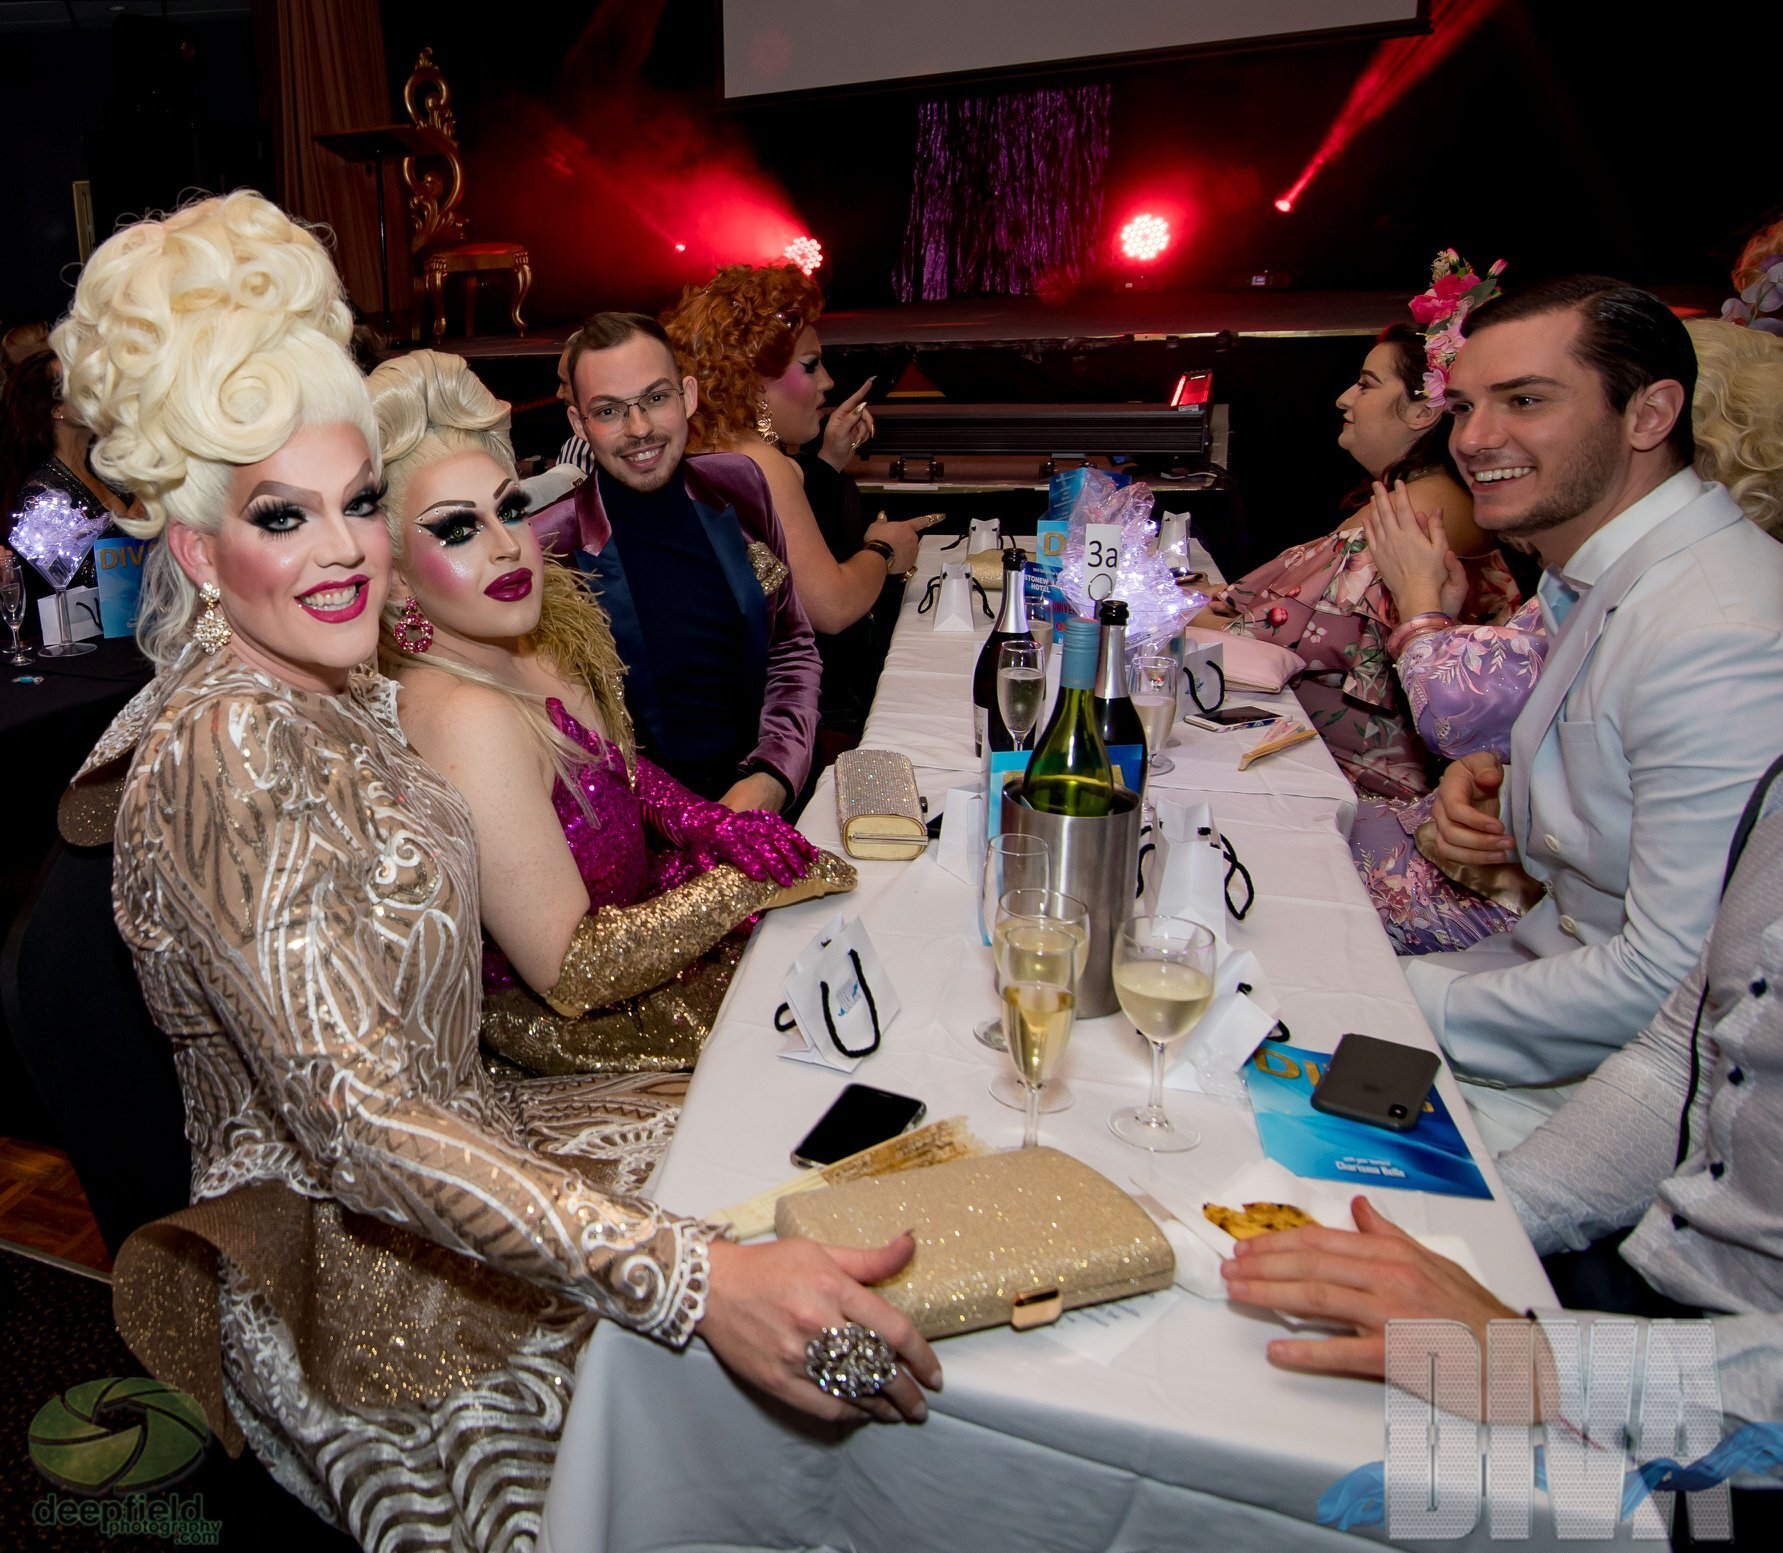 carmen-geddit-hannah-conda-jeremy-jack-christina-andie-diva-awards-sydney-drag-queen-royalty-best-hire-drag-race-australia.jpg